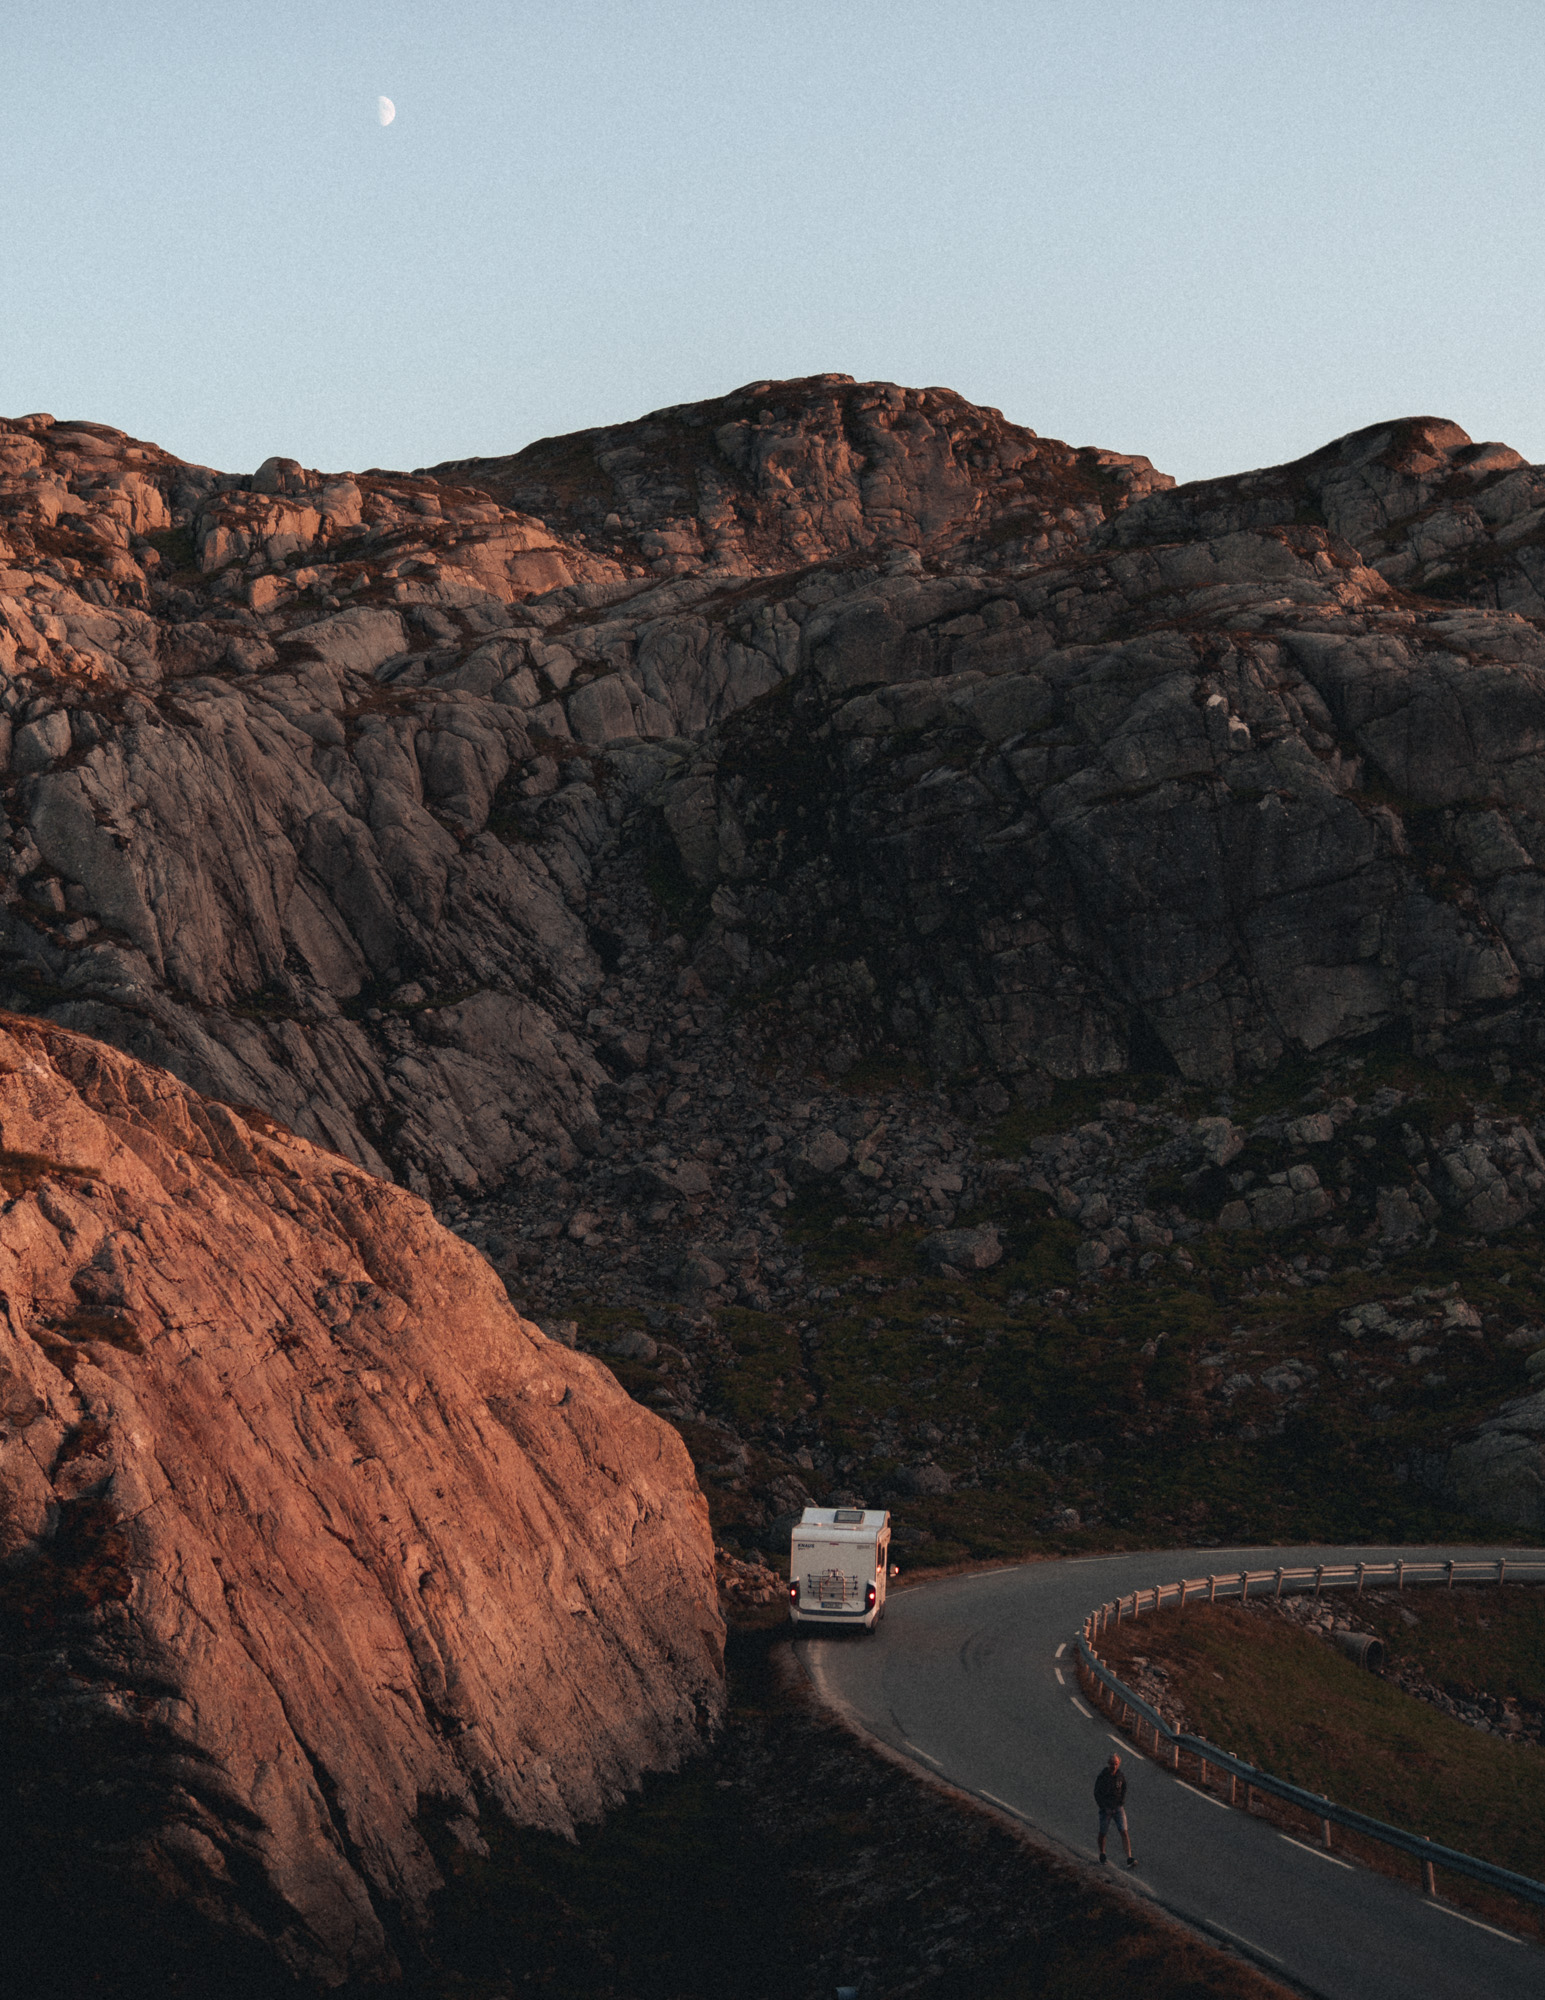 Wohnmobil am Straßenrand in Norwegen